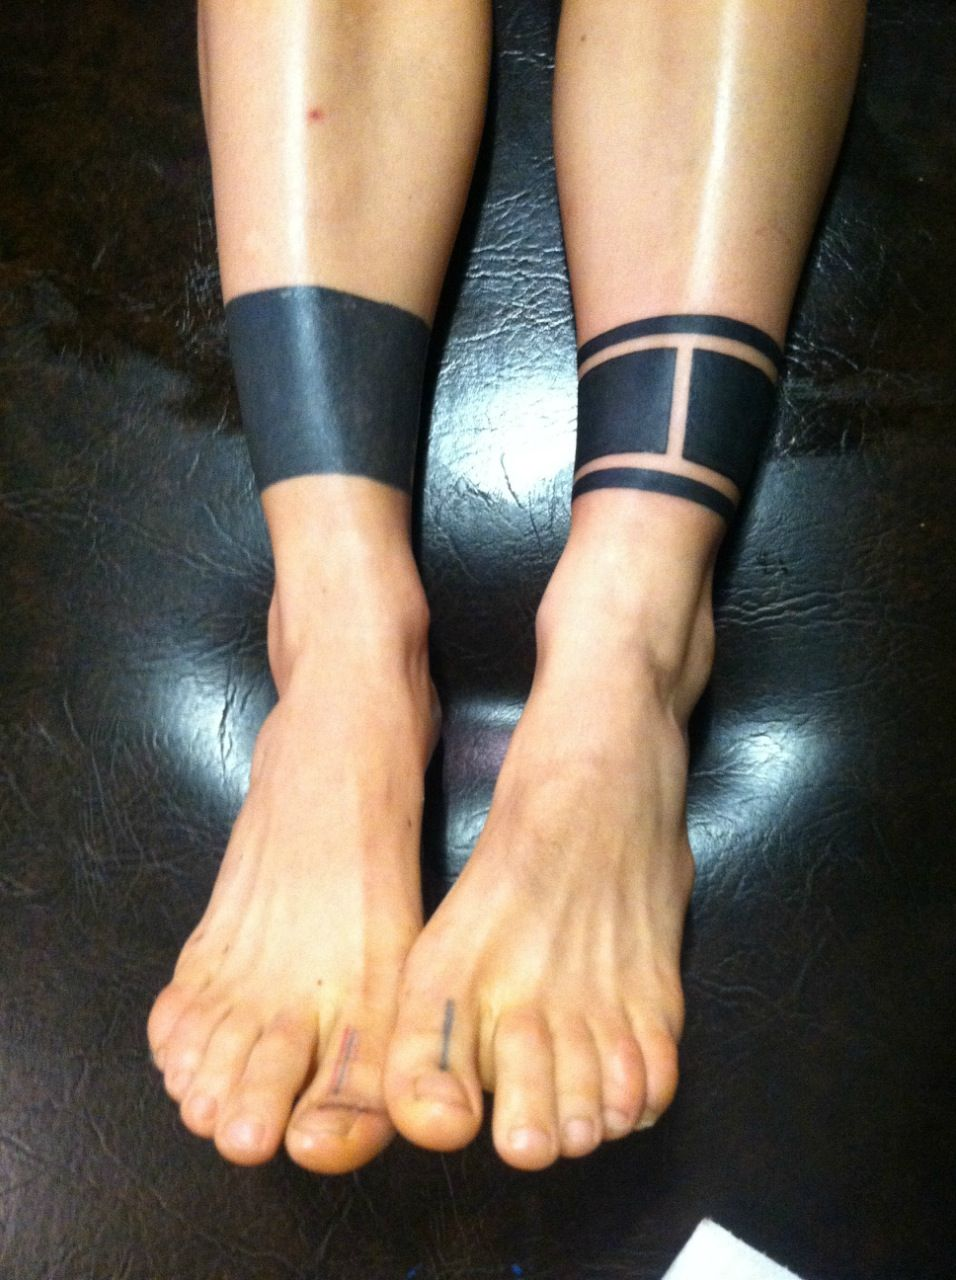 Blackwork tattoo skin pinterest bande tatouages et encre - Tatouage bande bras ...